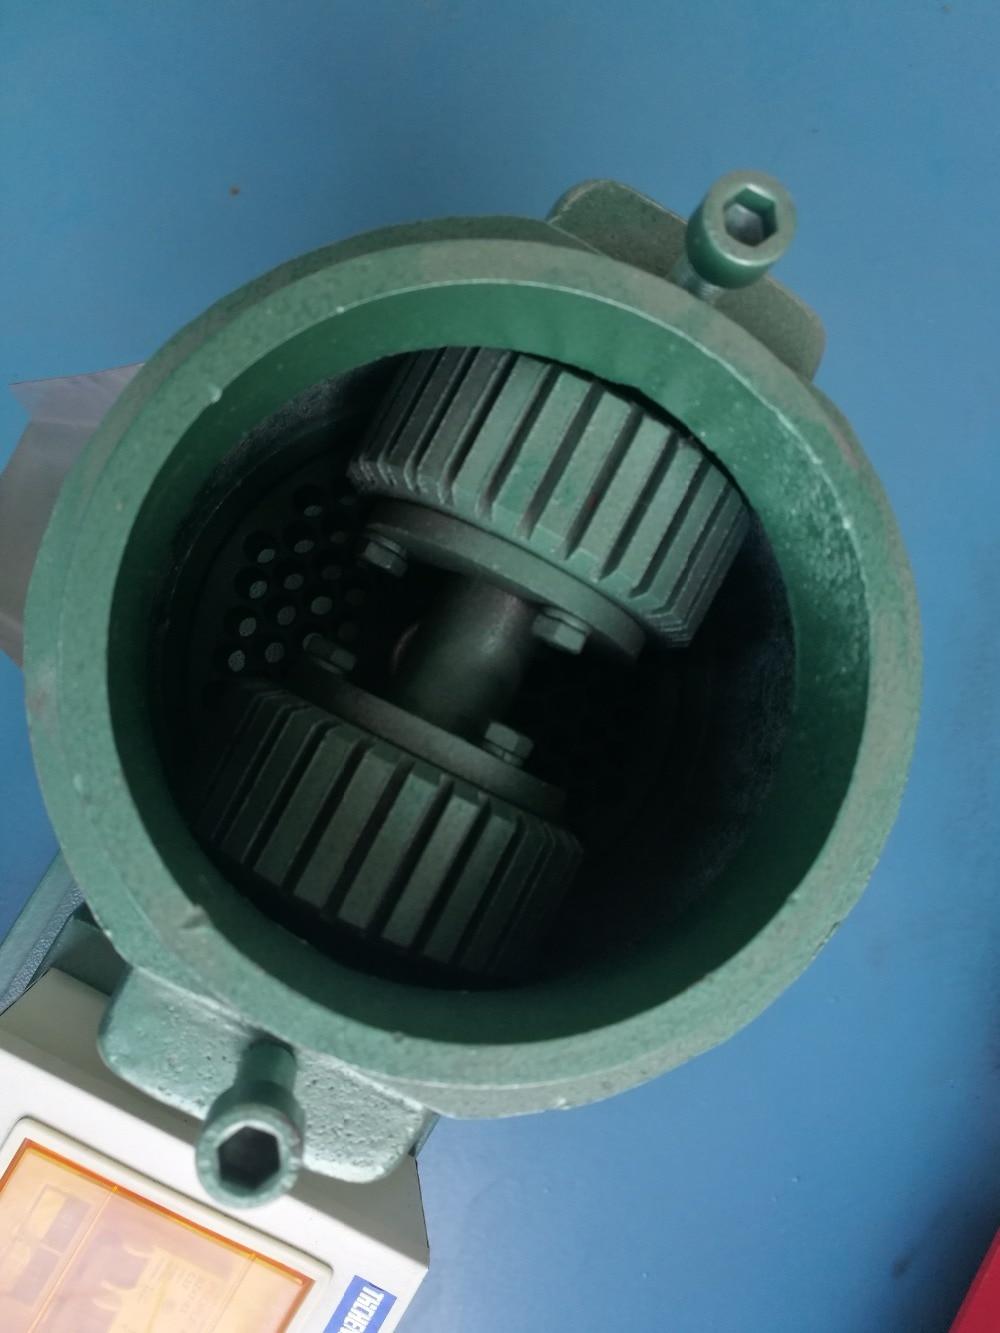 6 Mm Diameter Matrix And Roller Of KL150 Model Pellet Pressing Mill Machine